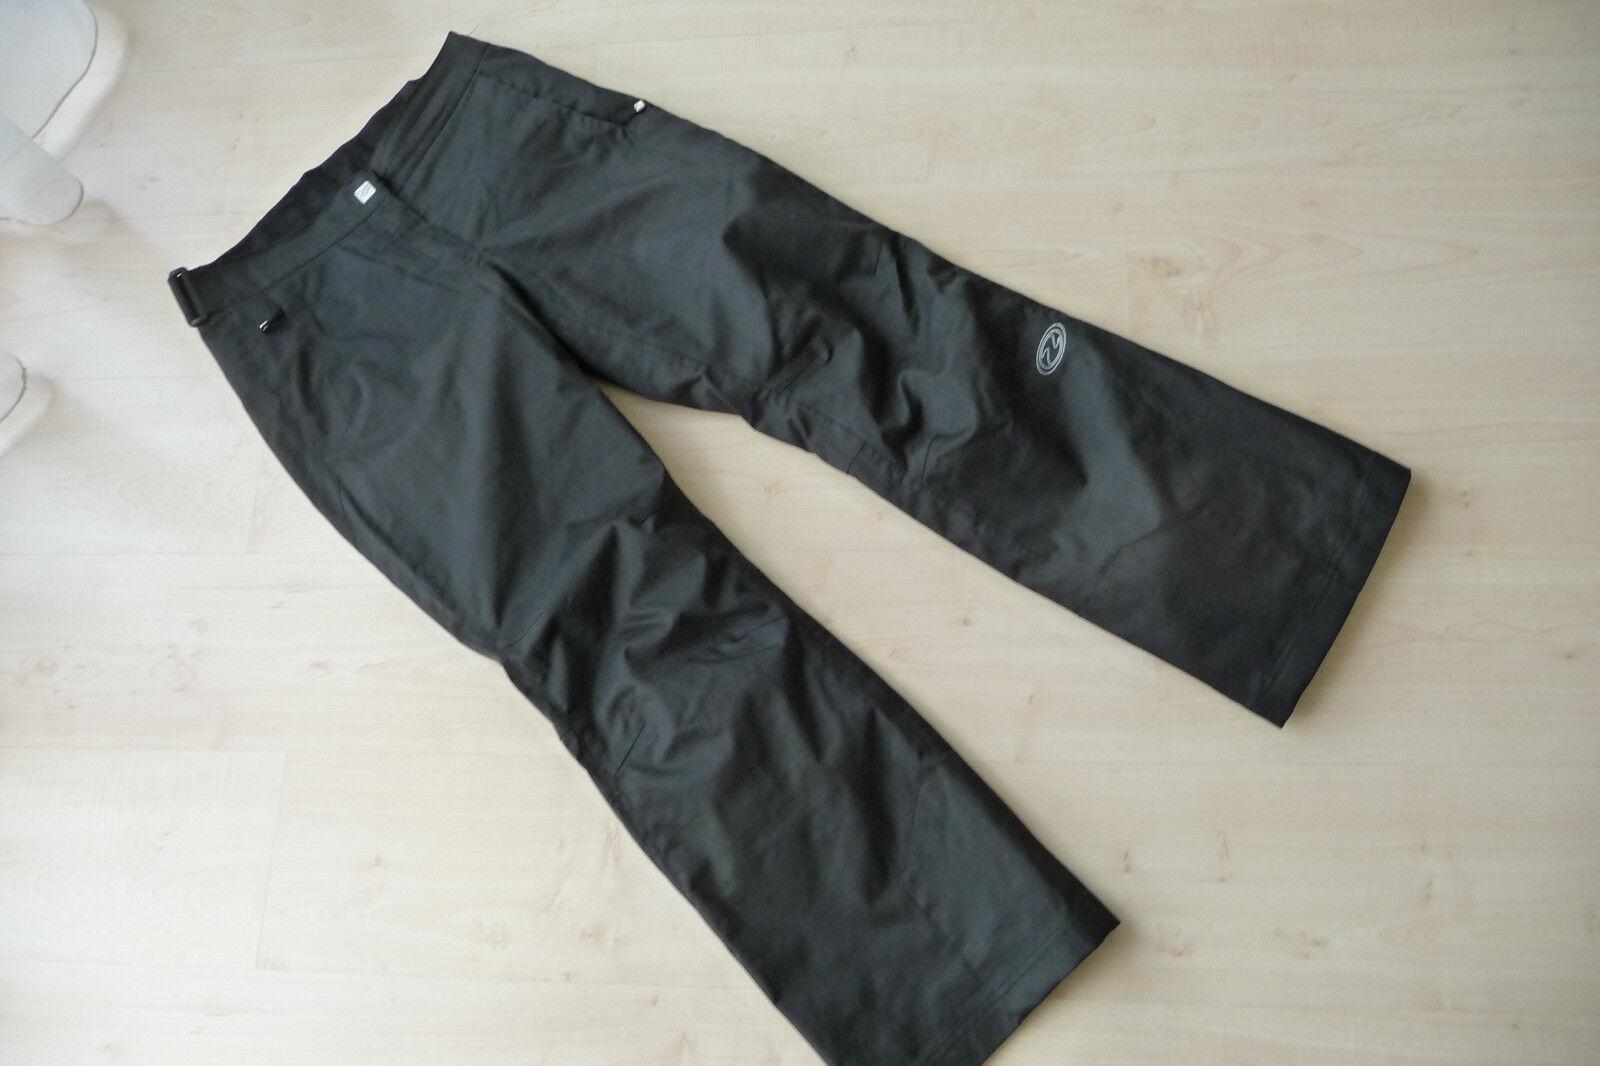 Ziener Damen Damen Ziener Ski/Snowboard Hose, Gr. 42, schwarz/anthracit. 18b5d1